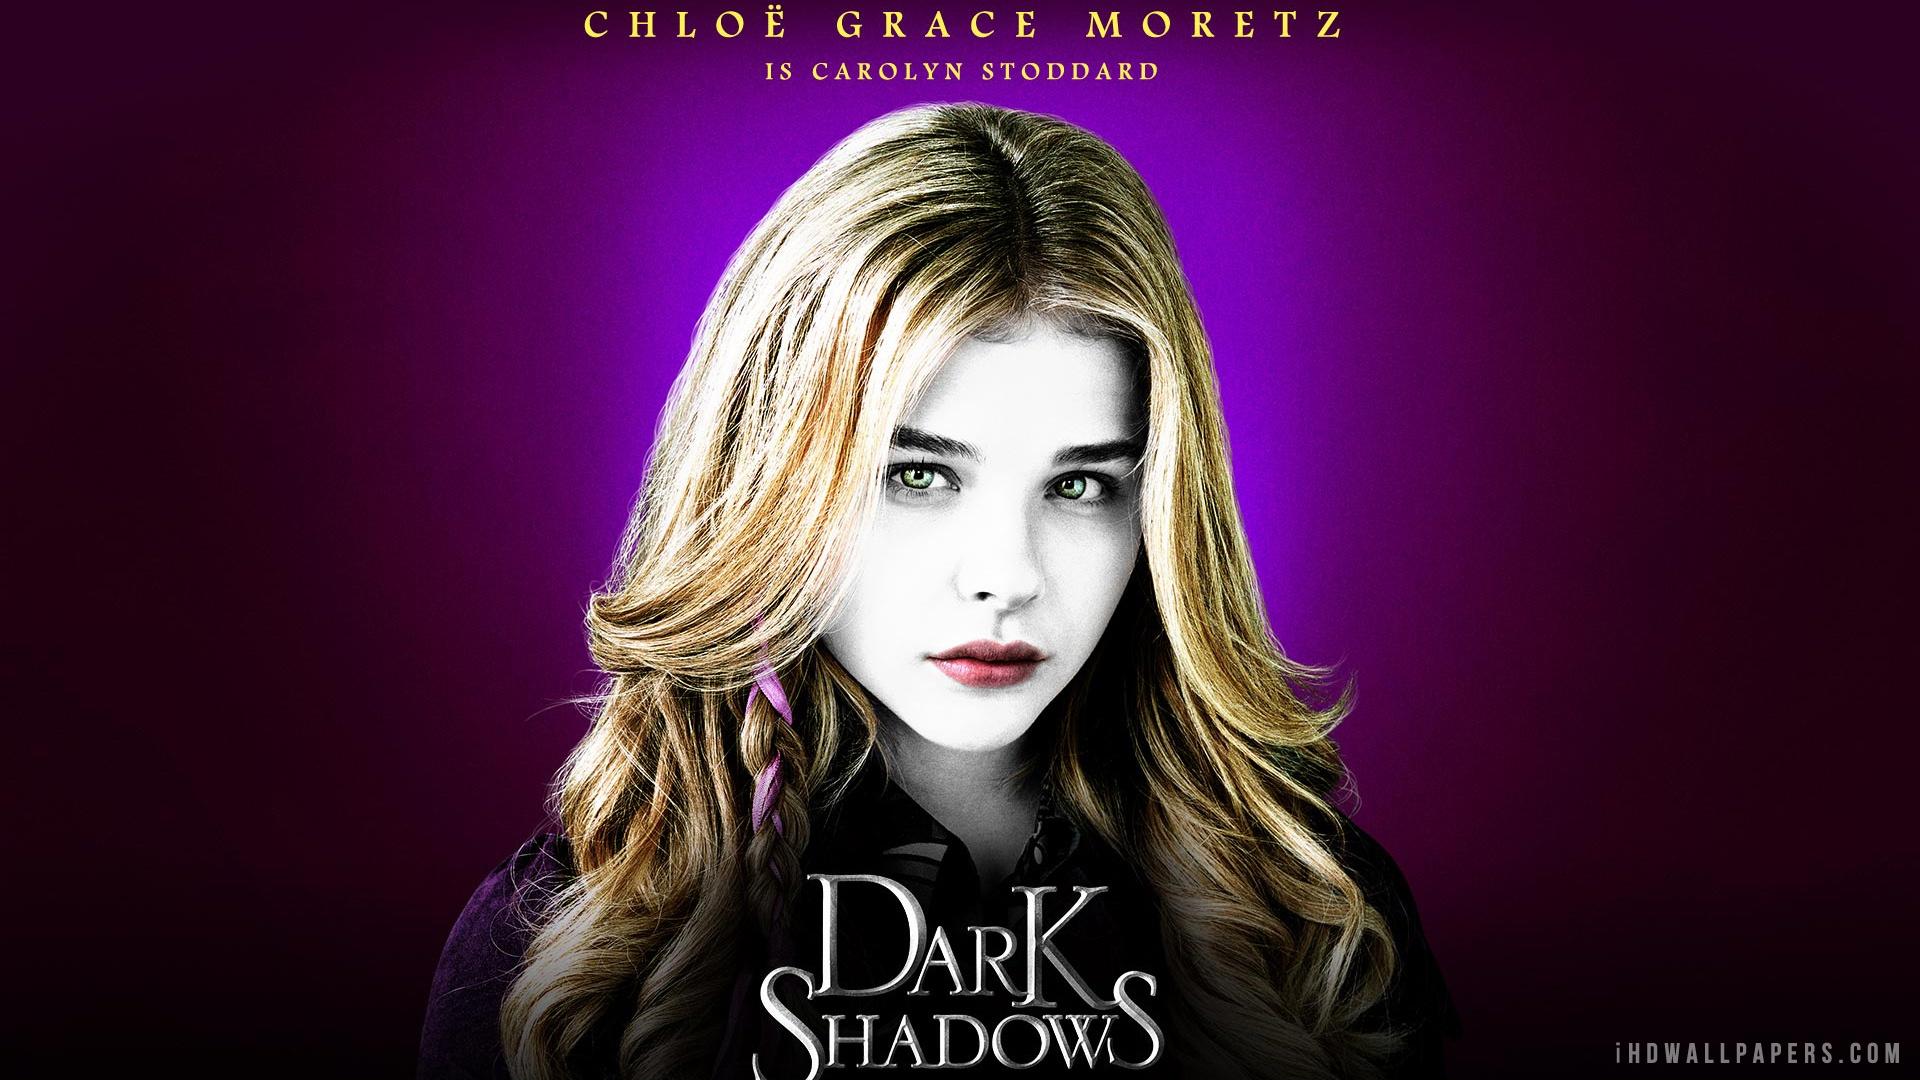 Chloe Moretz in Dark Shadows HD Wallpaper   iHD Wallpapers 1920x1080